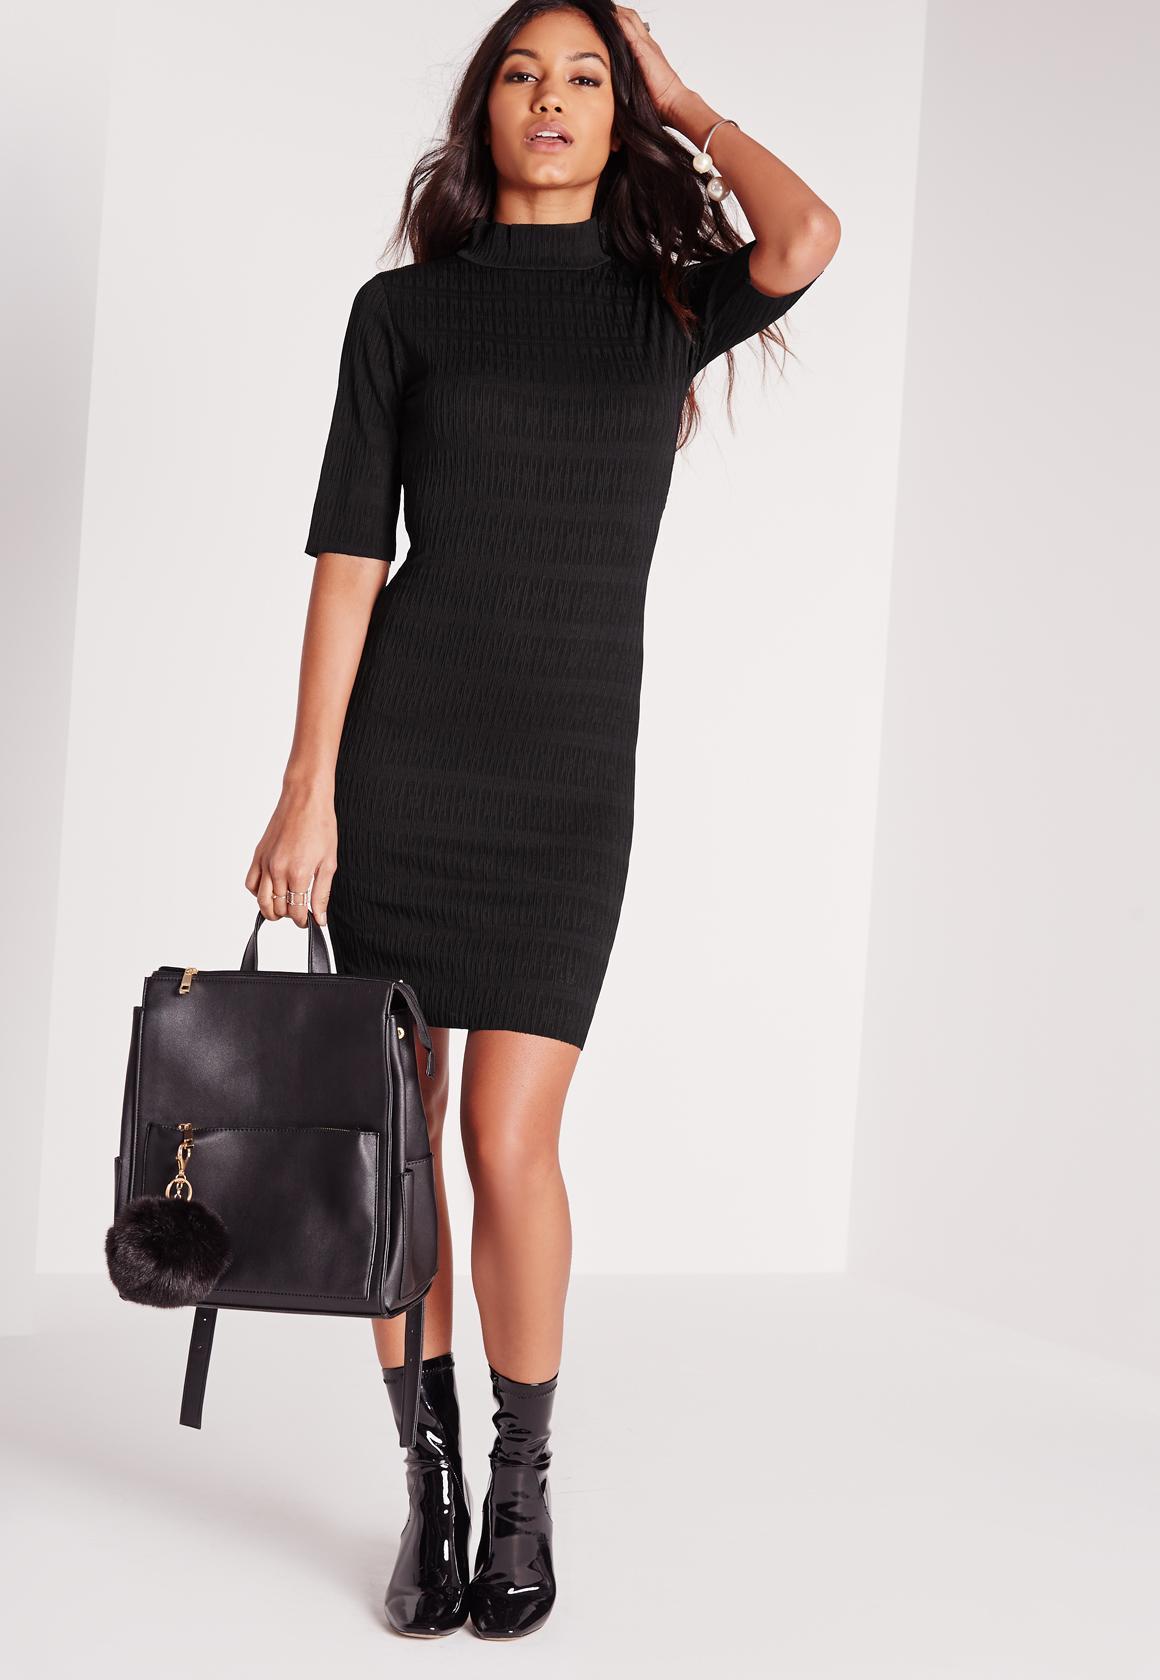 Short Sleeve Textured Dress Black